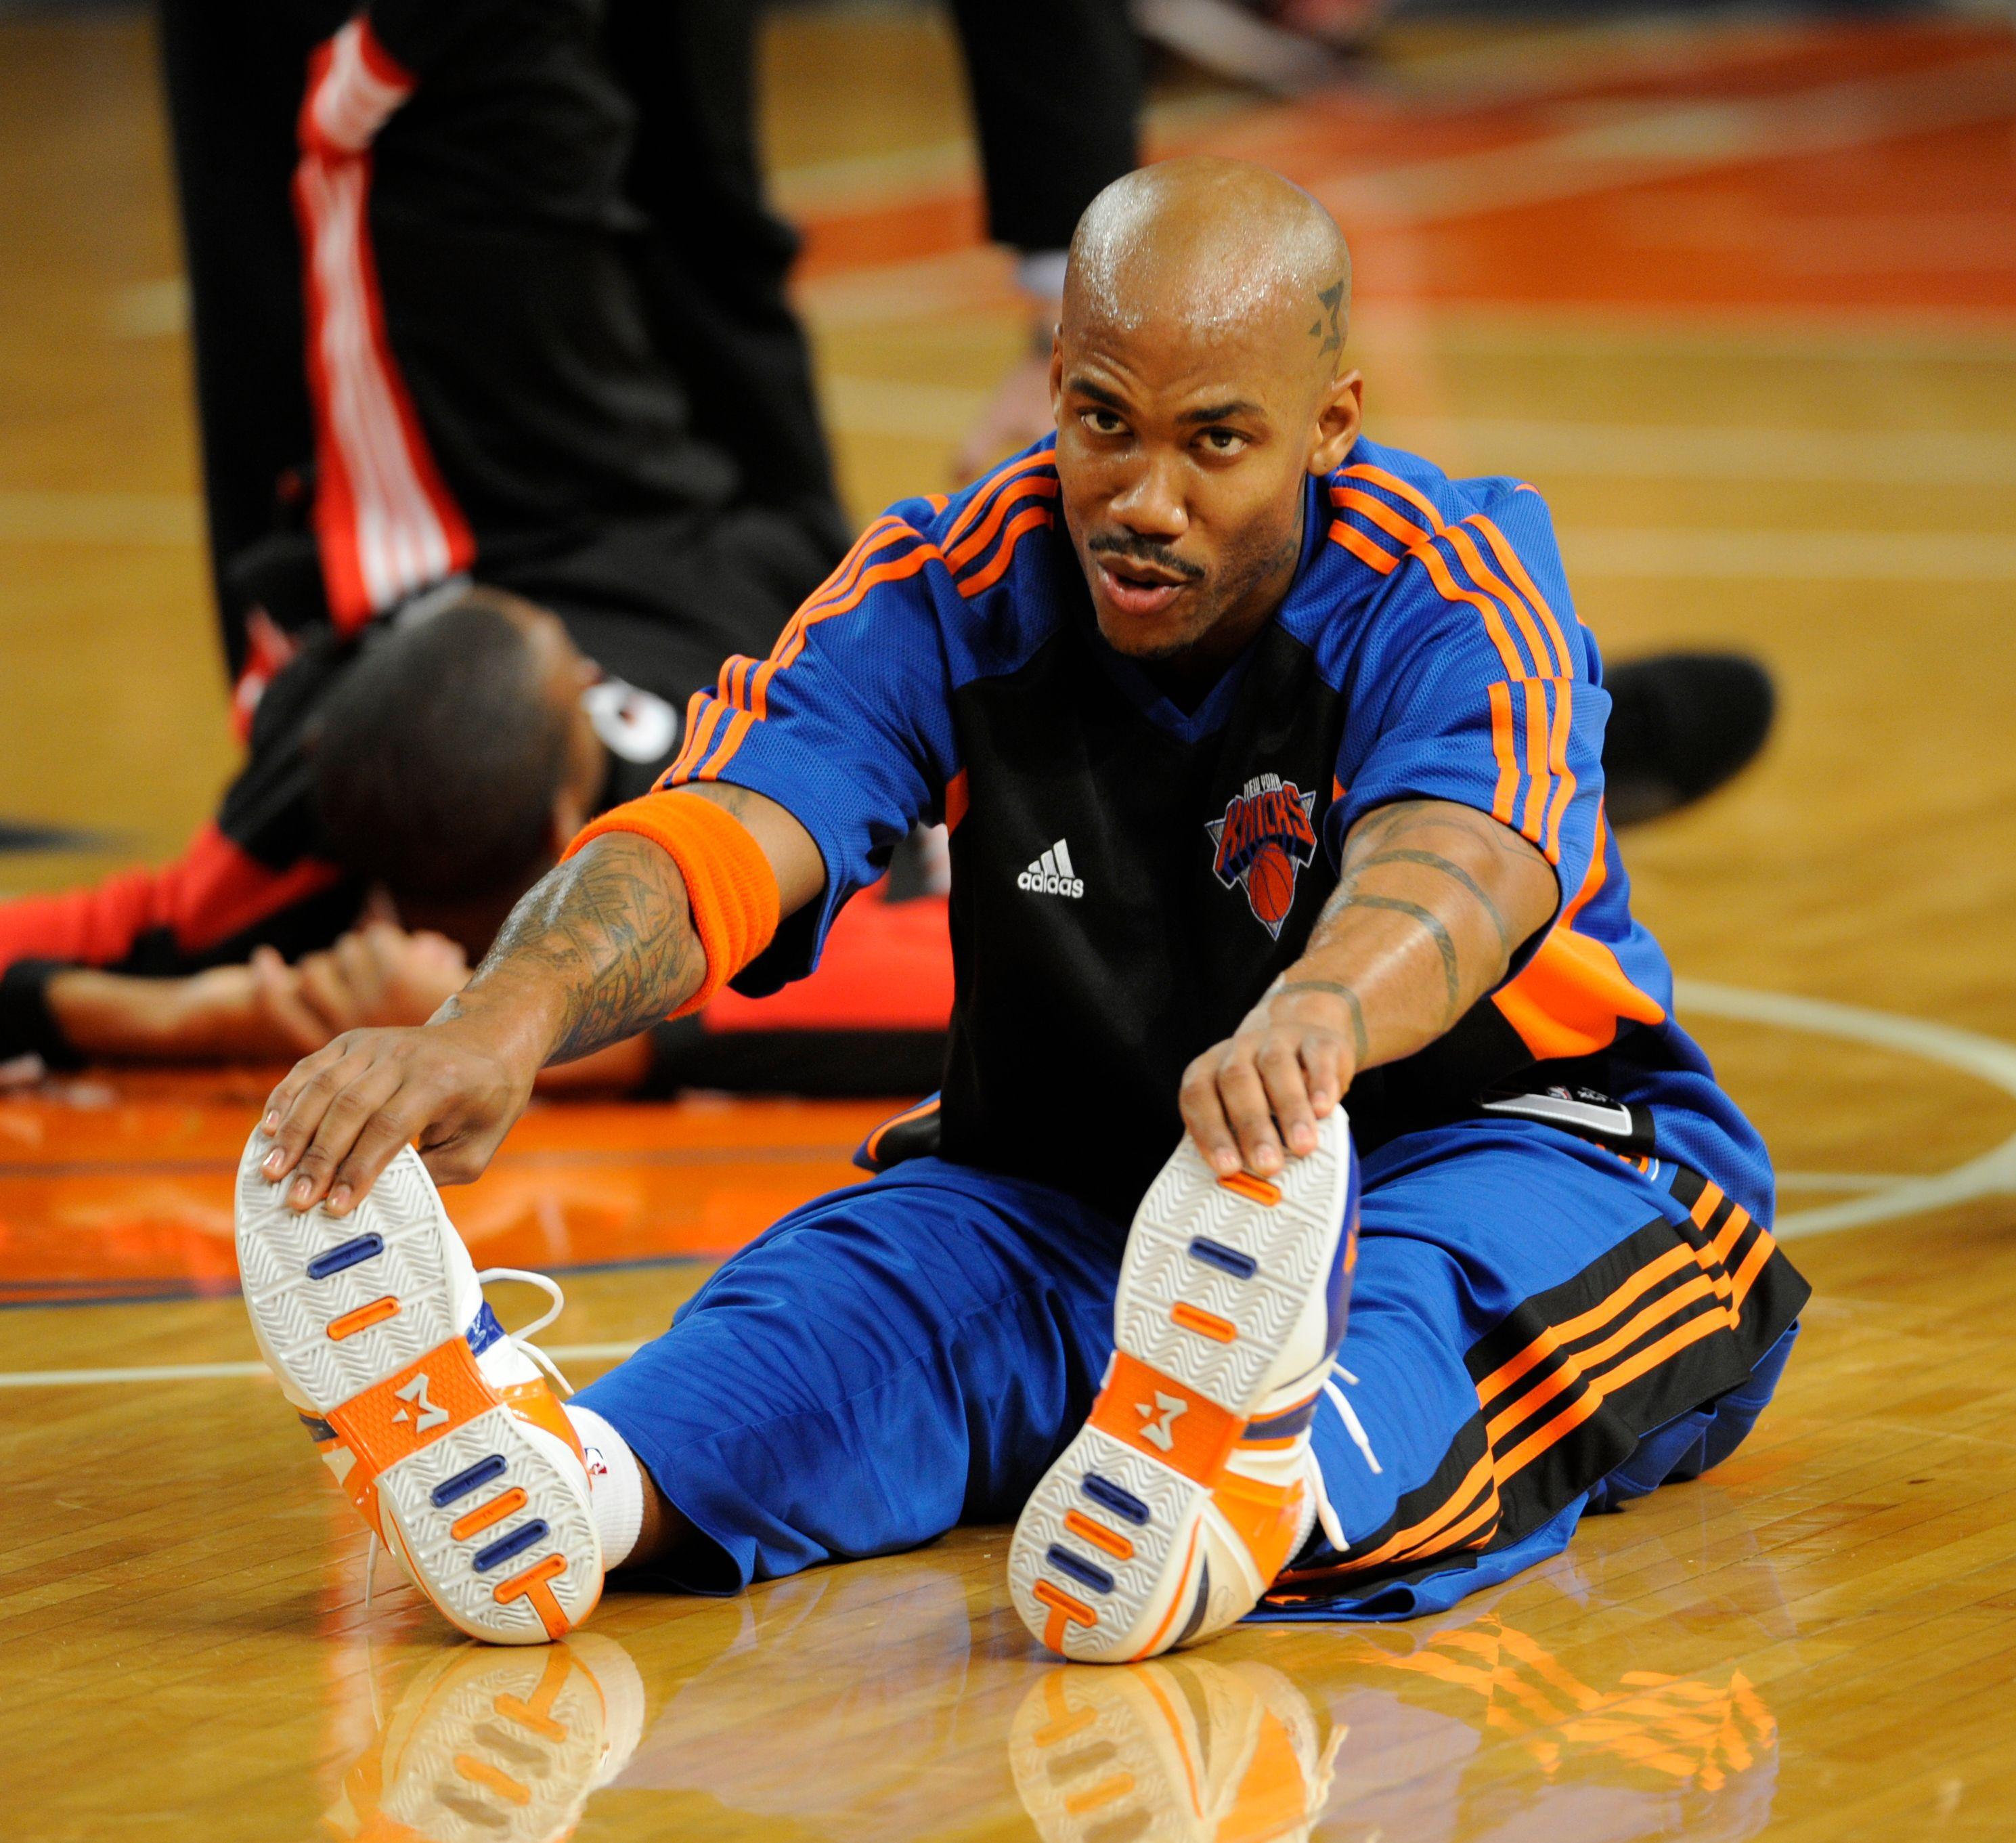 Stephon Marbury with the Knicks in 2008. Xxx Knicks Rd388 Jpg S Bkn Usa Ny